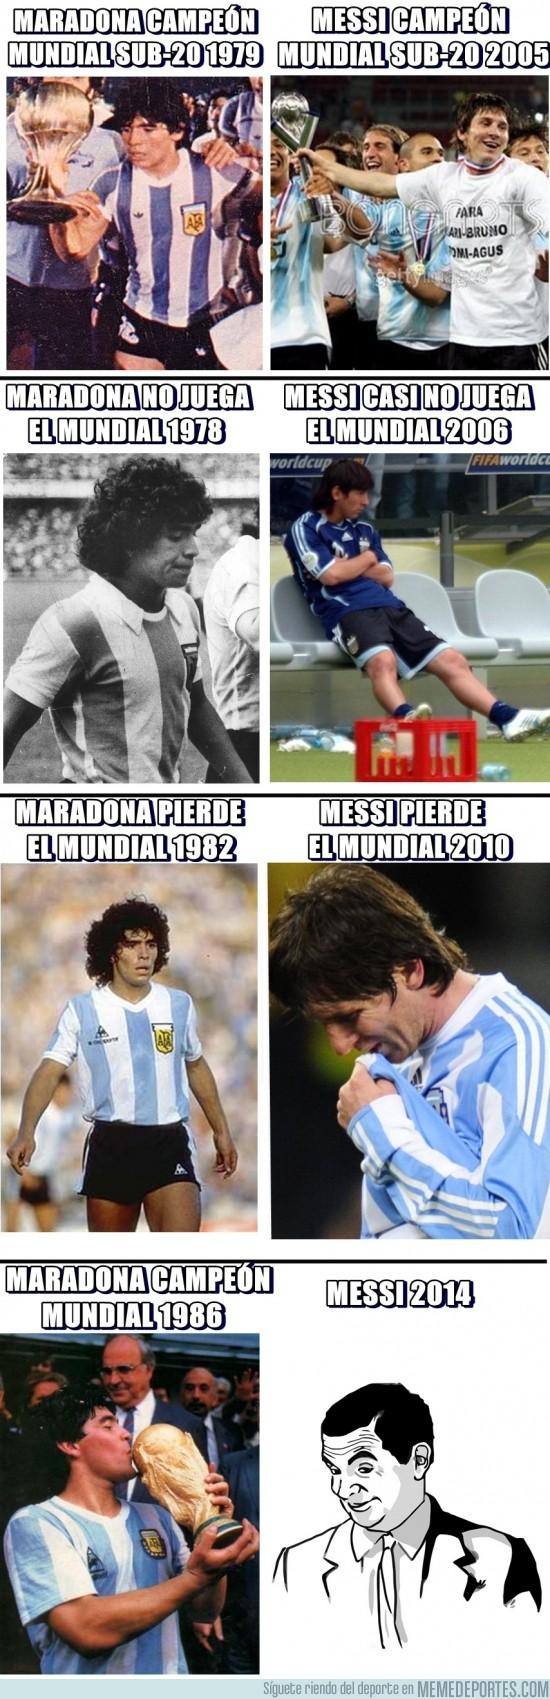 94632 - Similitudes entre Maradona y Messi